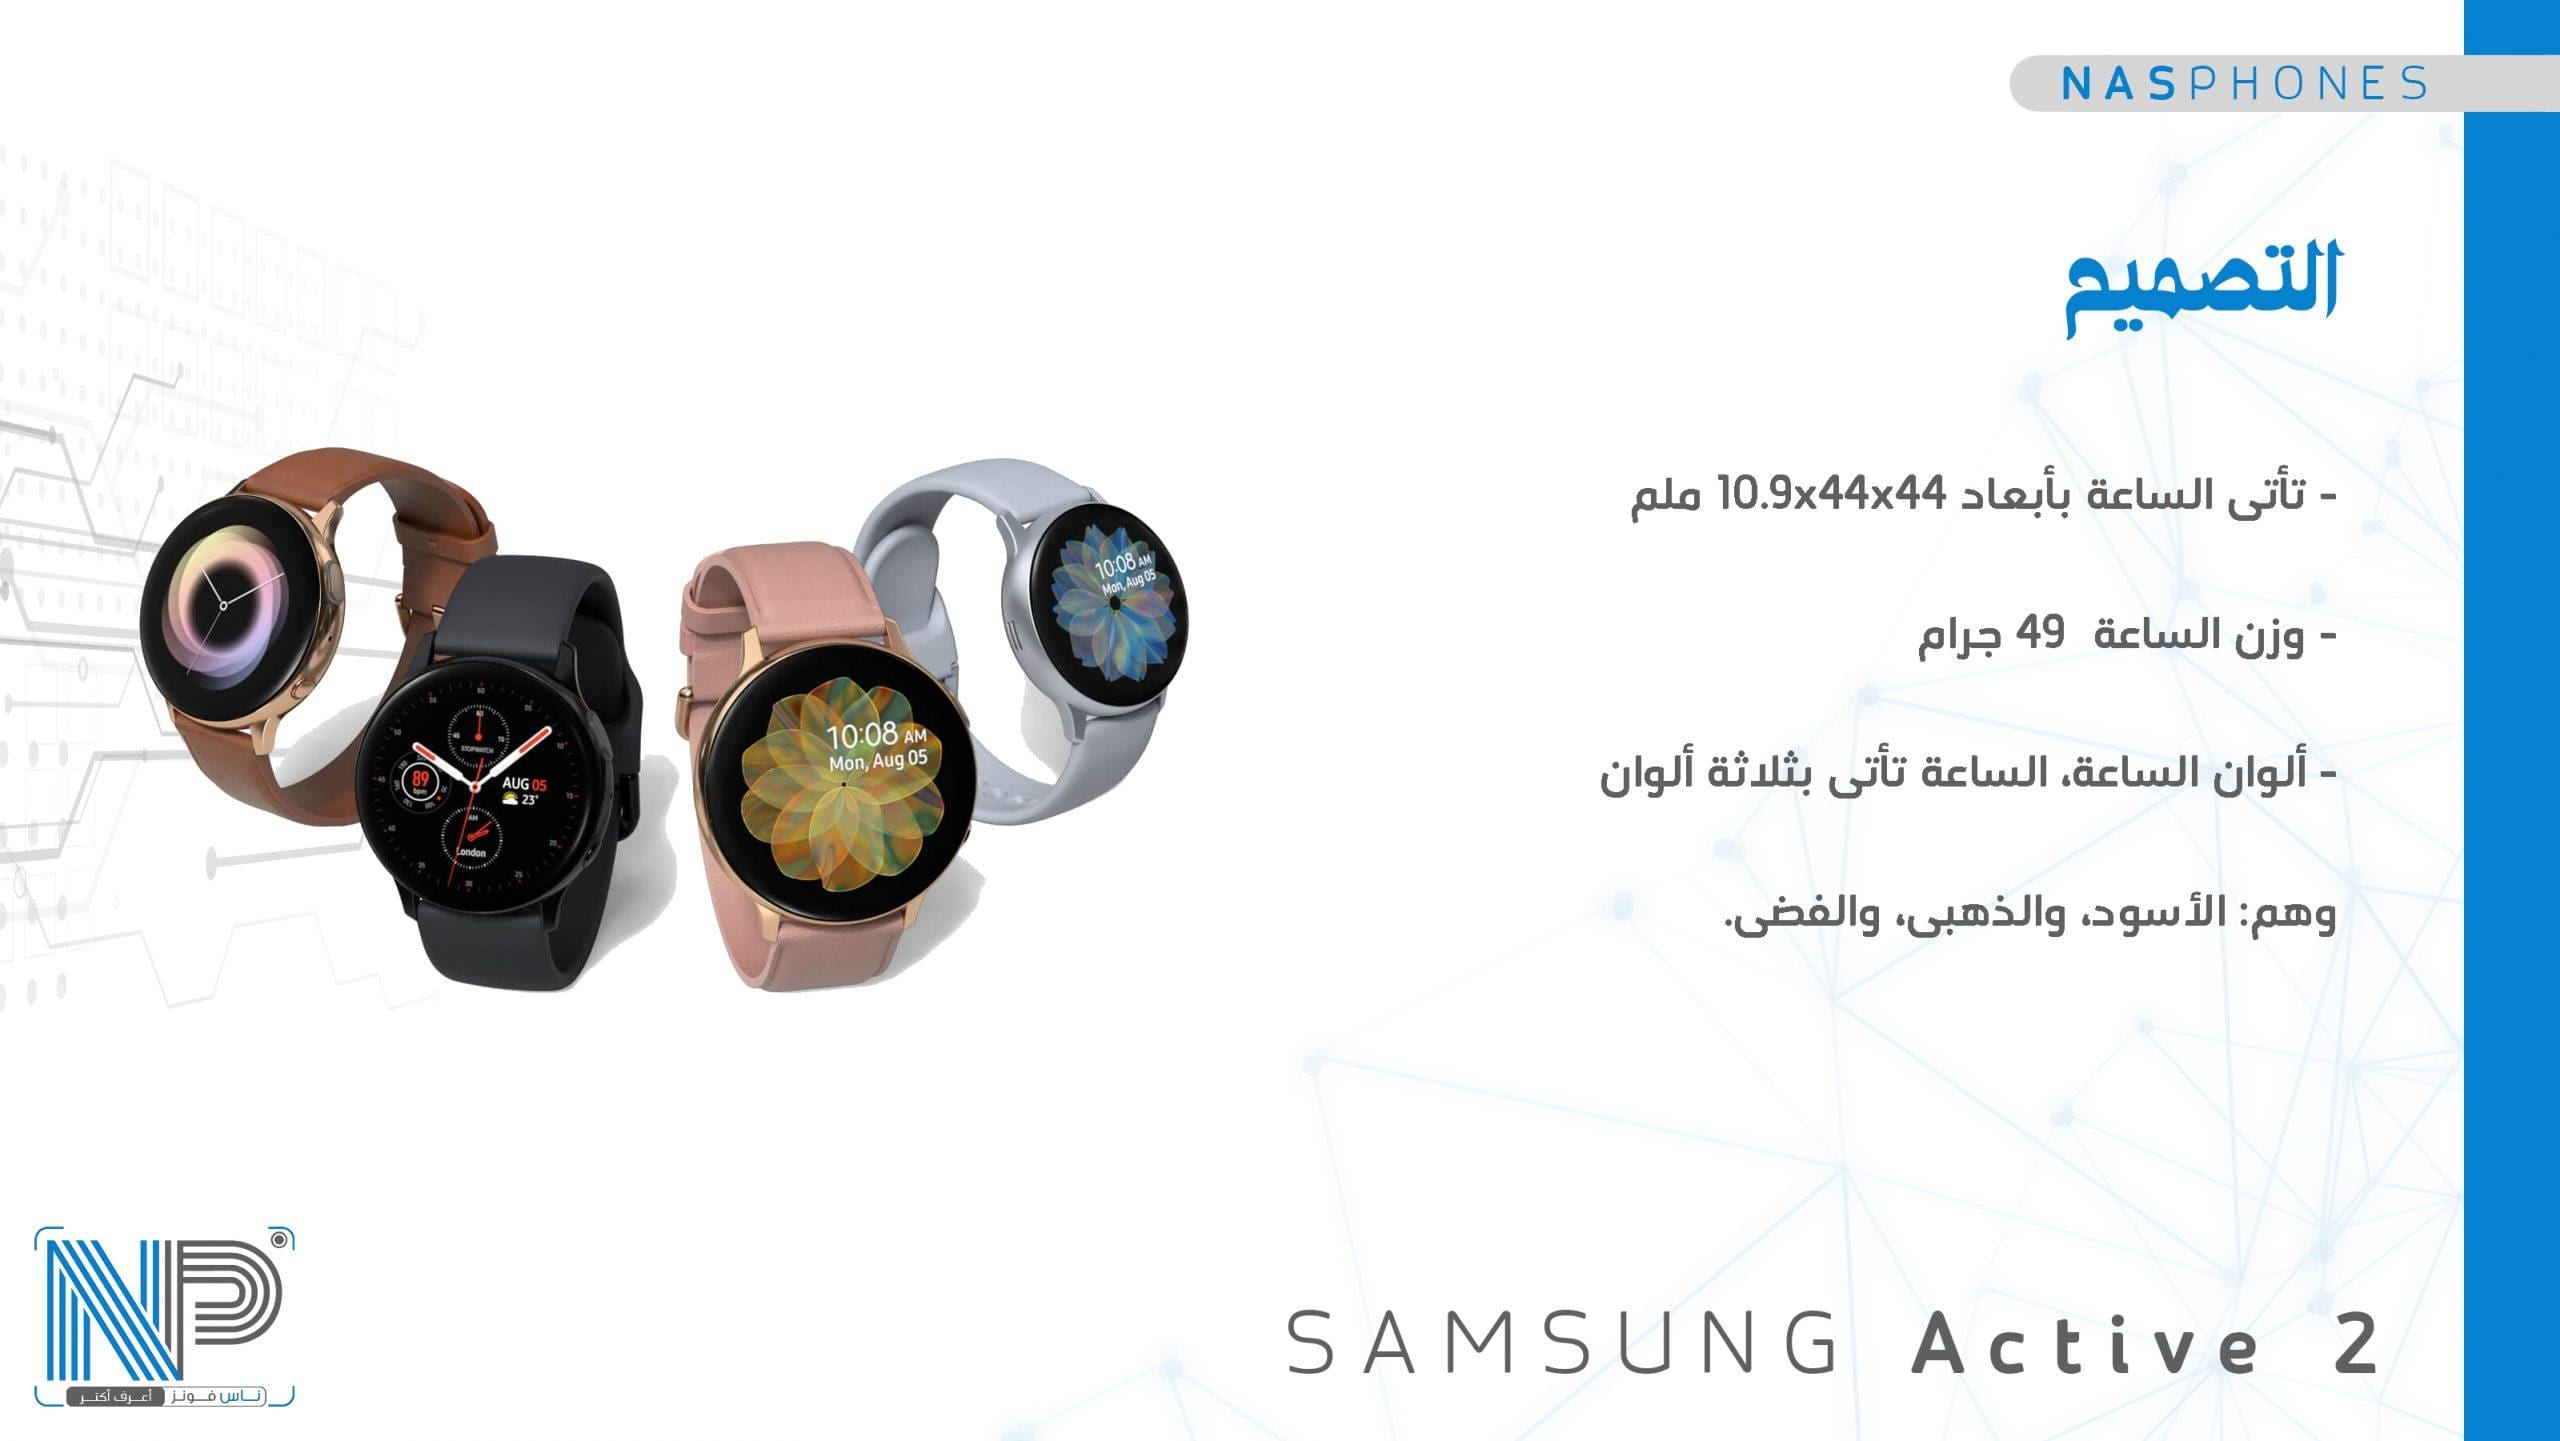 تصميم Samsung active 2